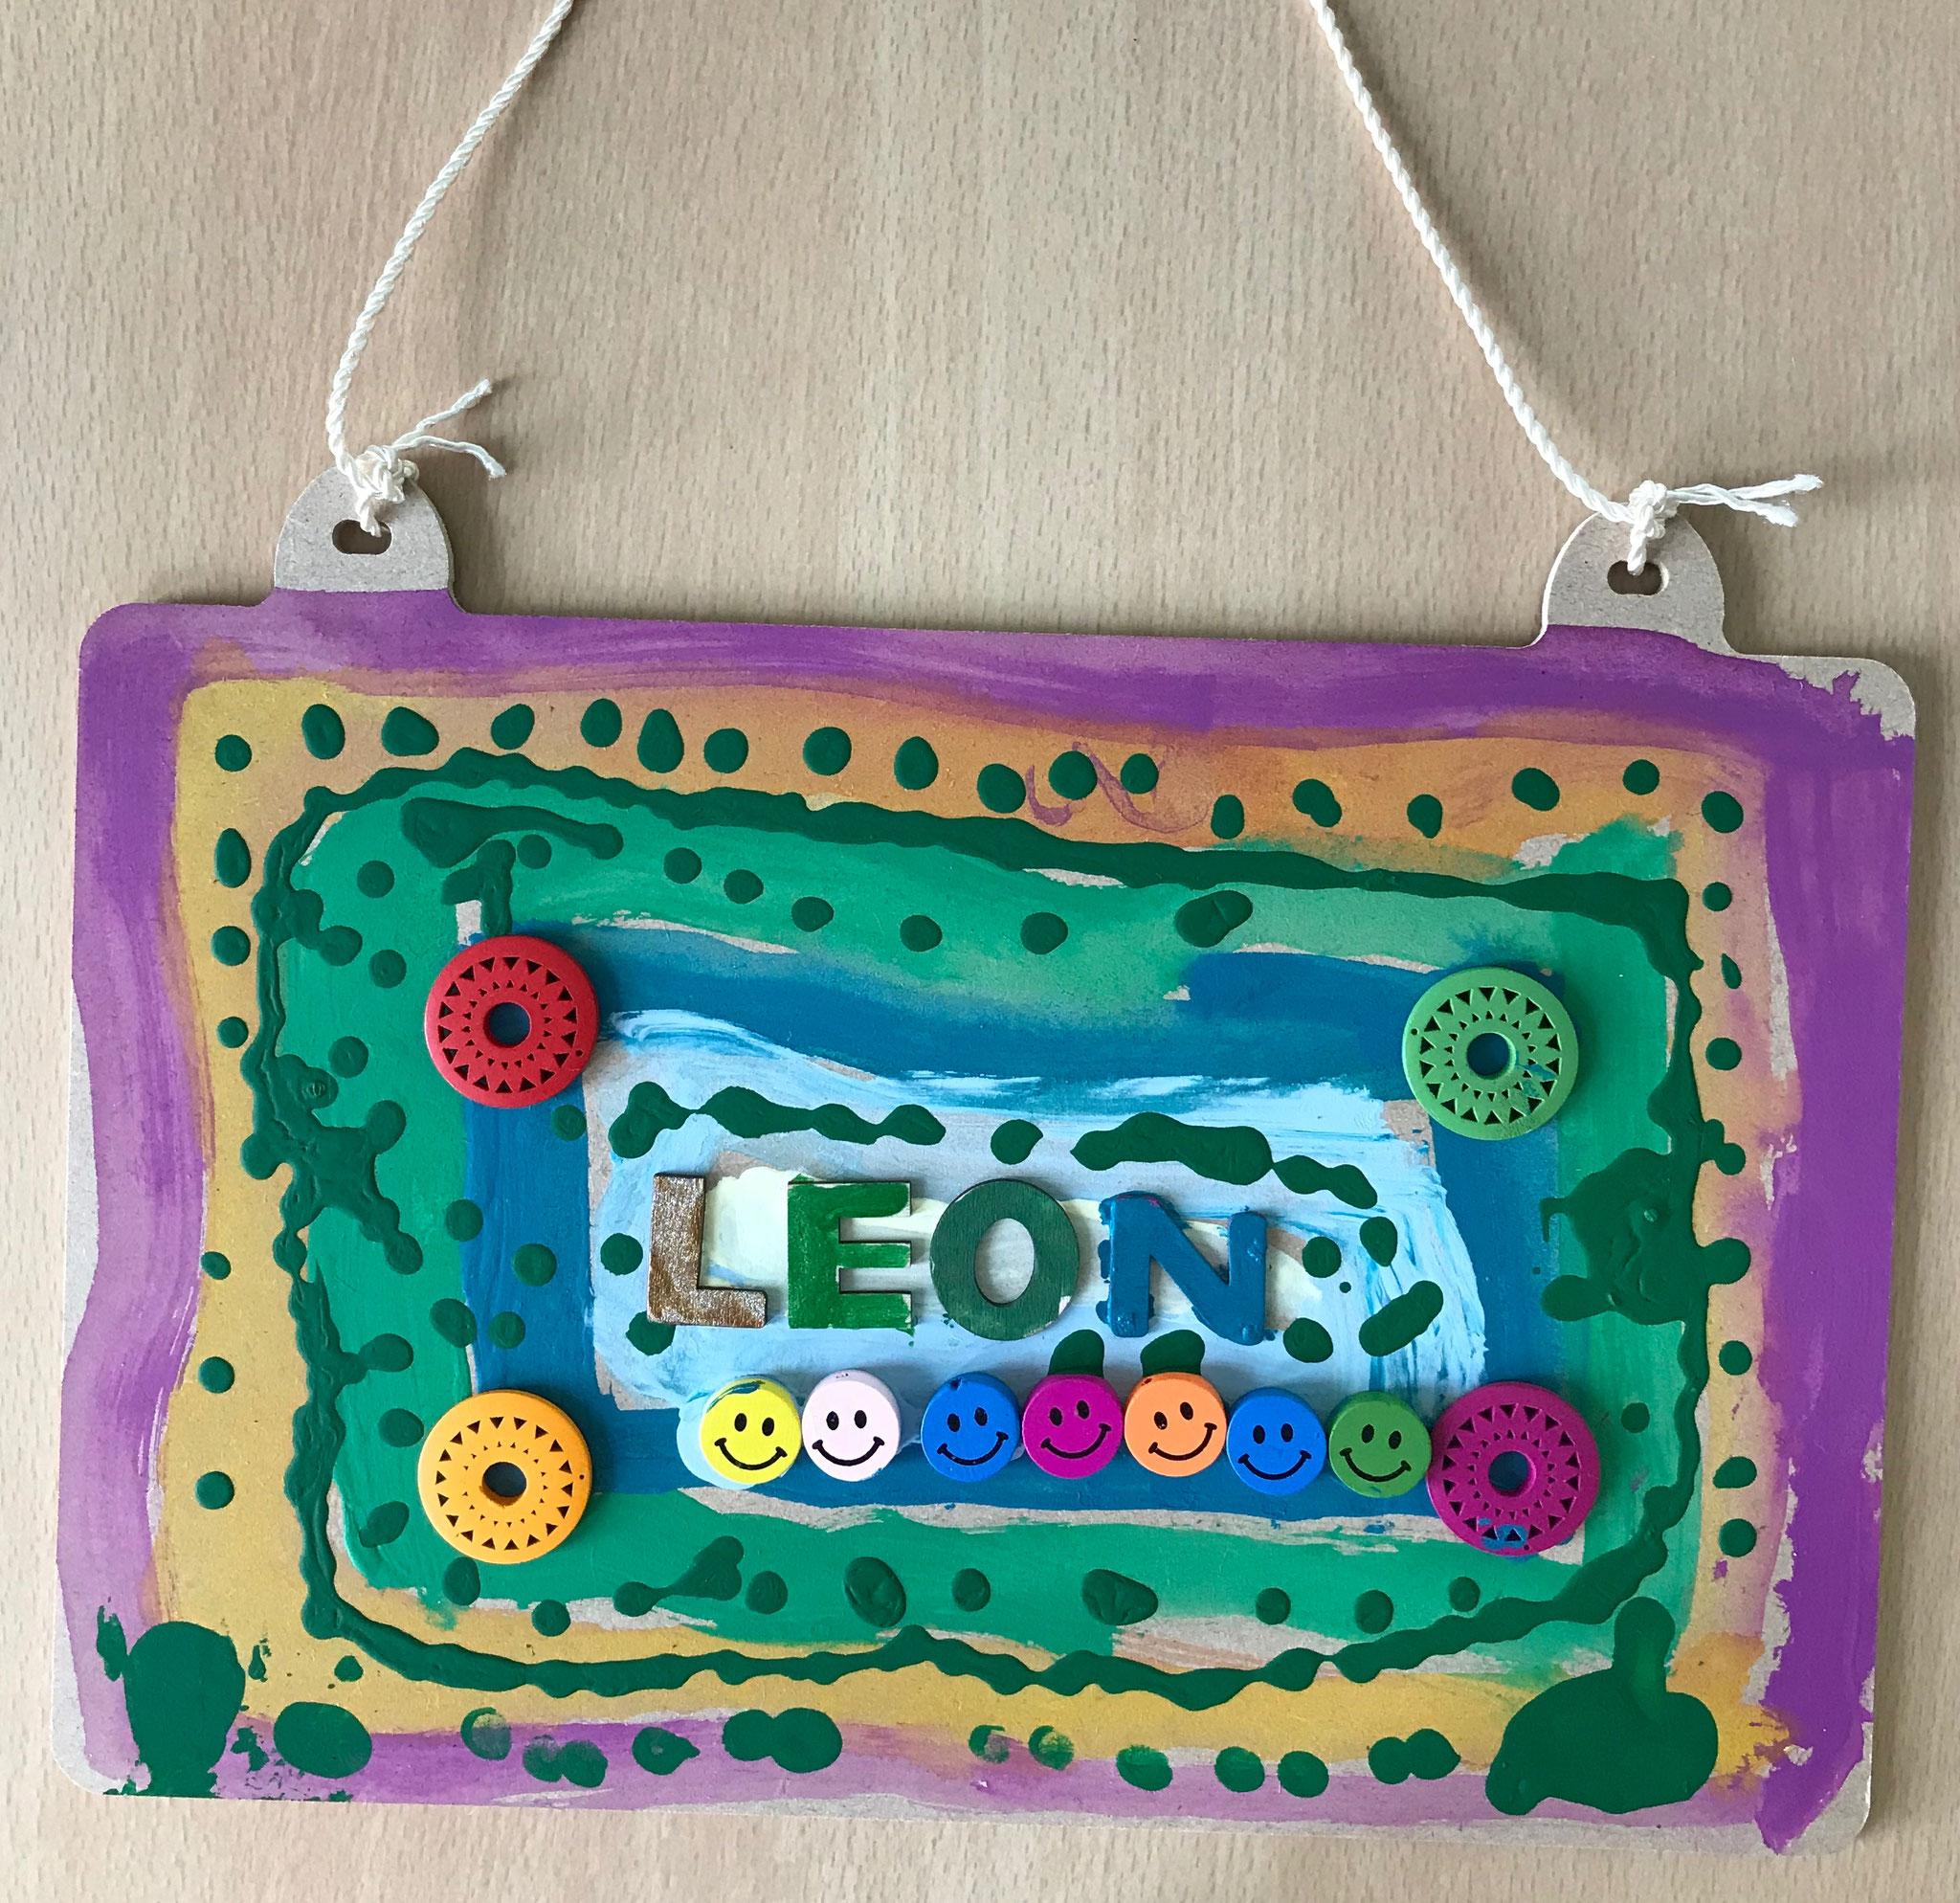 Leon - 6 Jahre